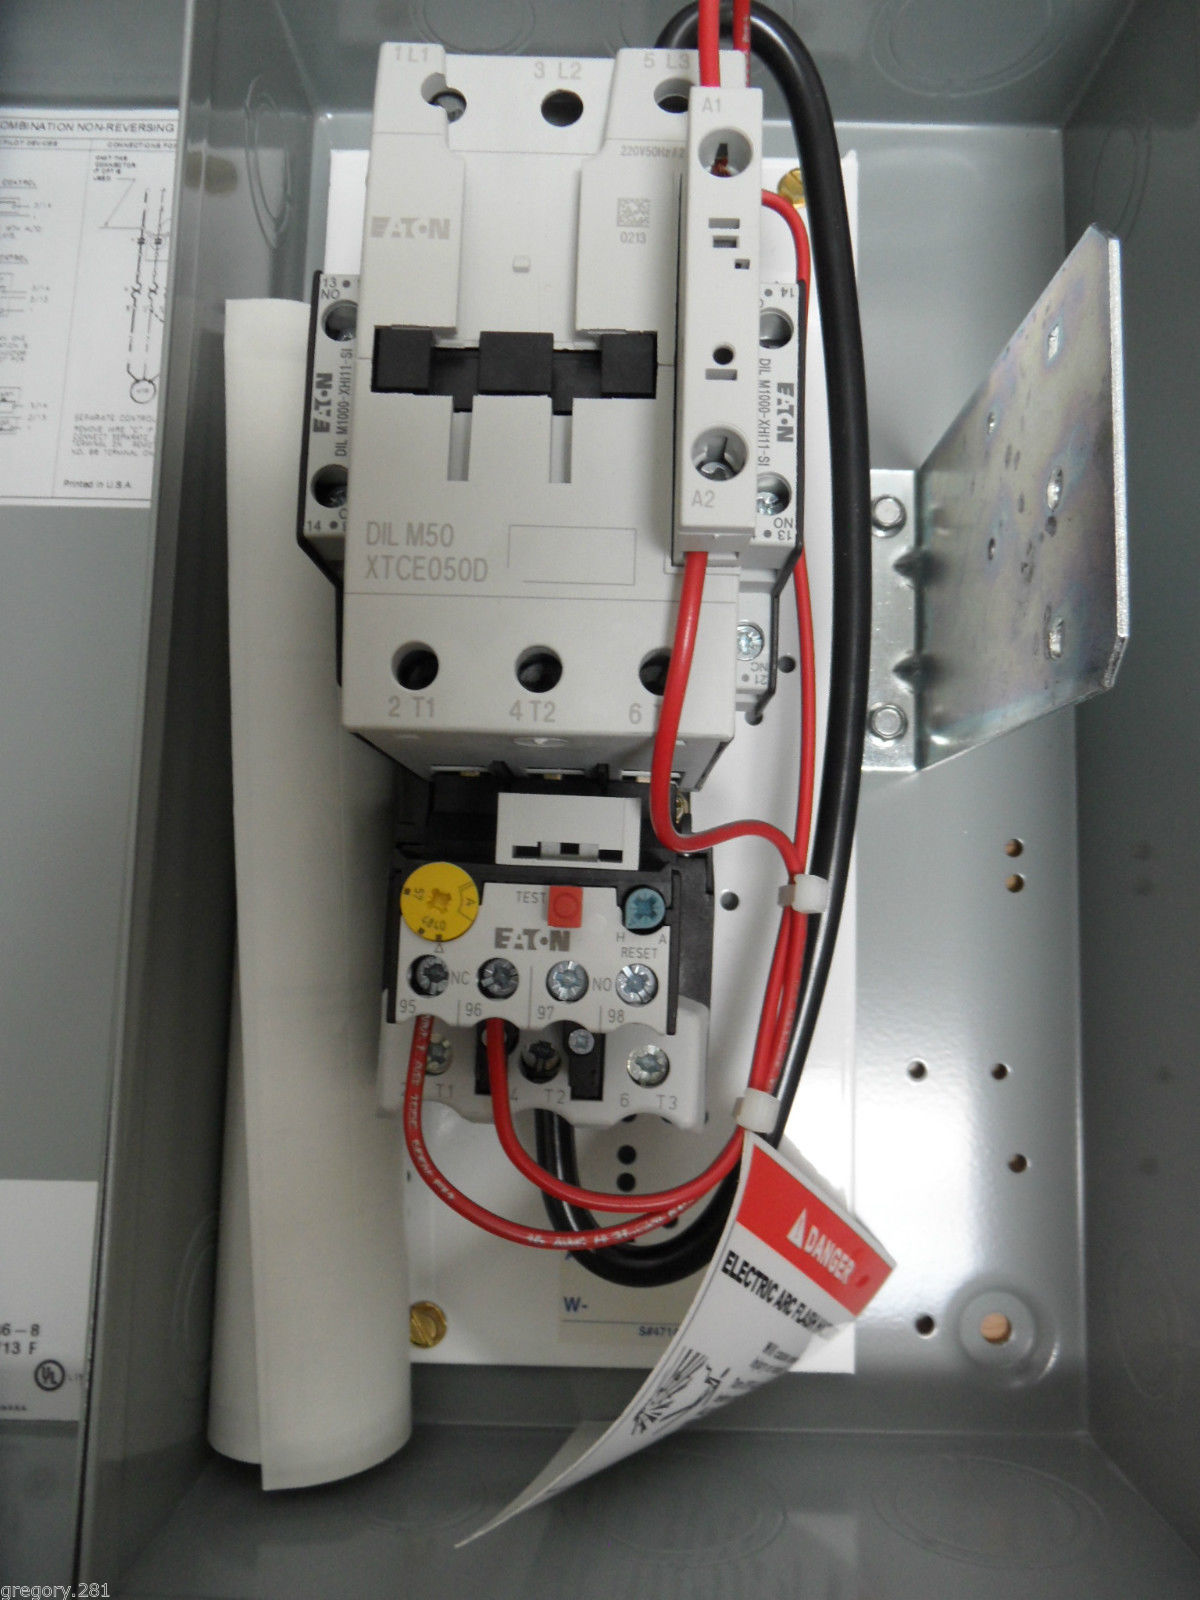 small resolution of eaton fvnr starter wiring diagram motor soft starter circuitcircuit eaton ecx09k1baa qa27s29 non combination iec fvnr